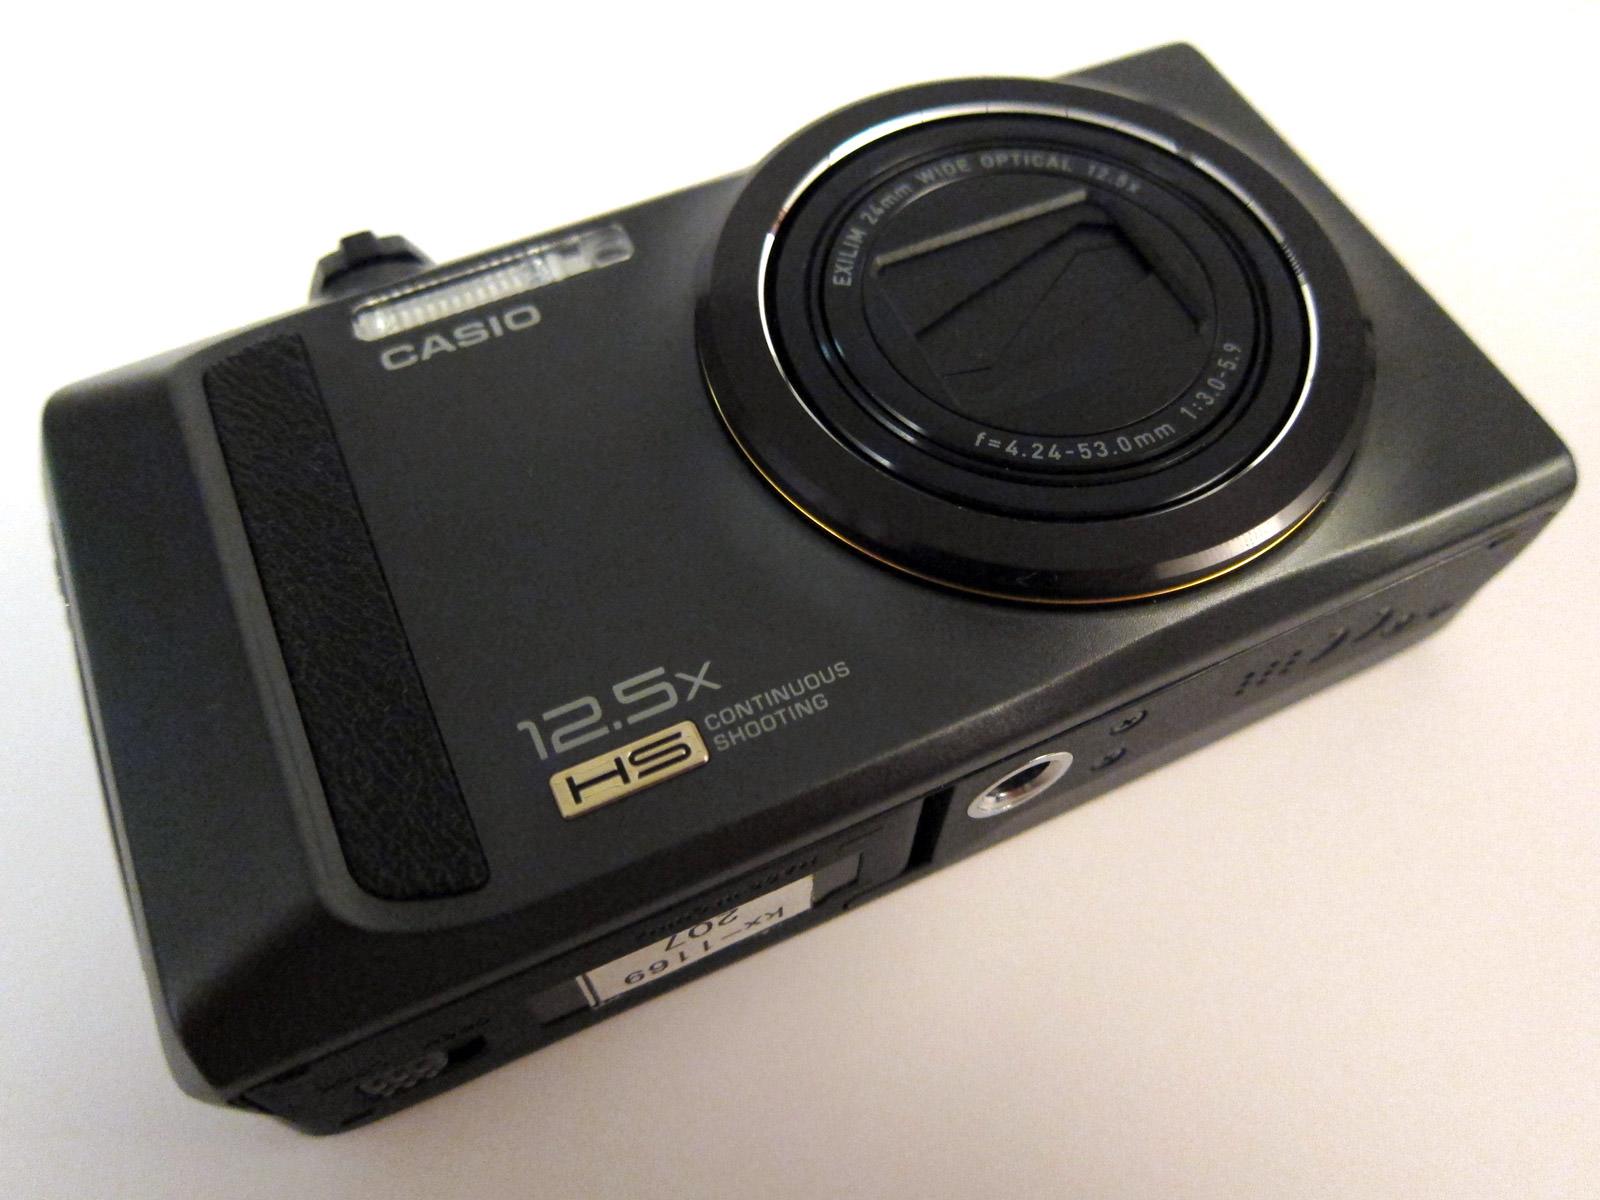 casio exilim zr100 digital camera review rh ephotozine com Casio Calculator Instruction Manual casio ex-zr100 manual